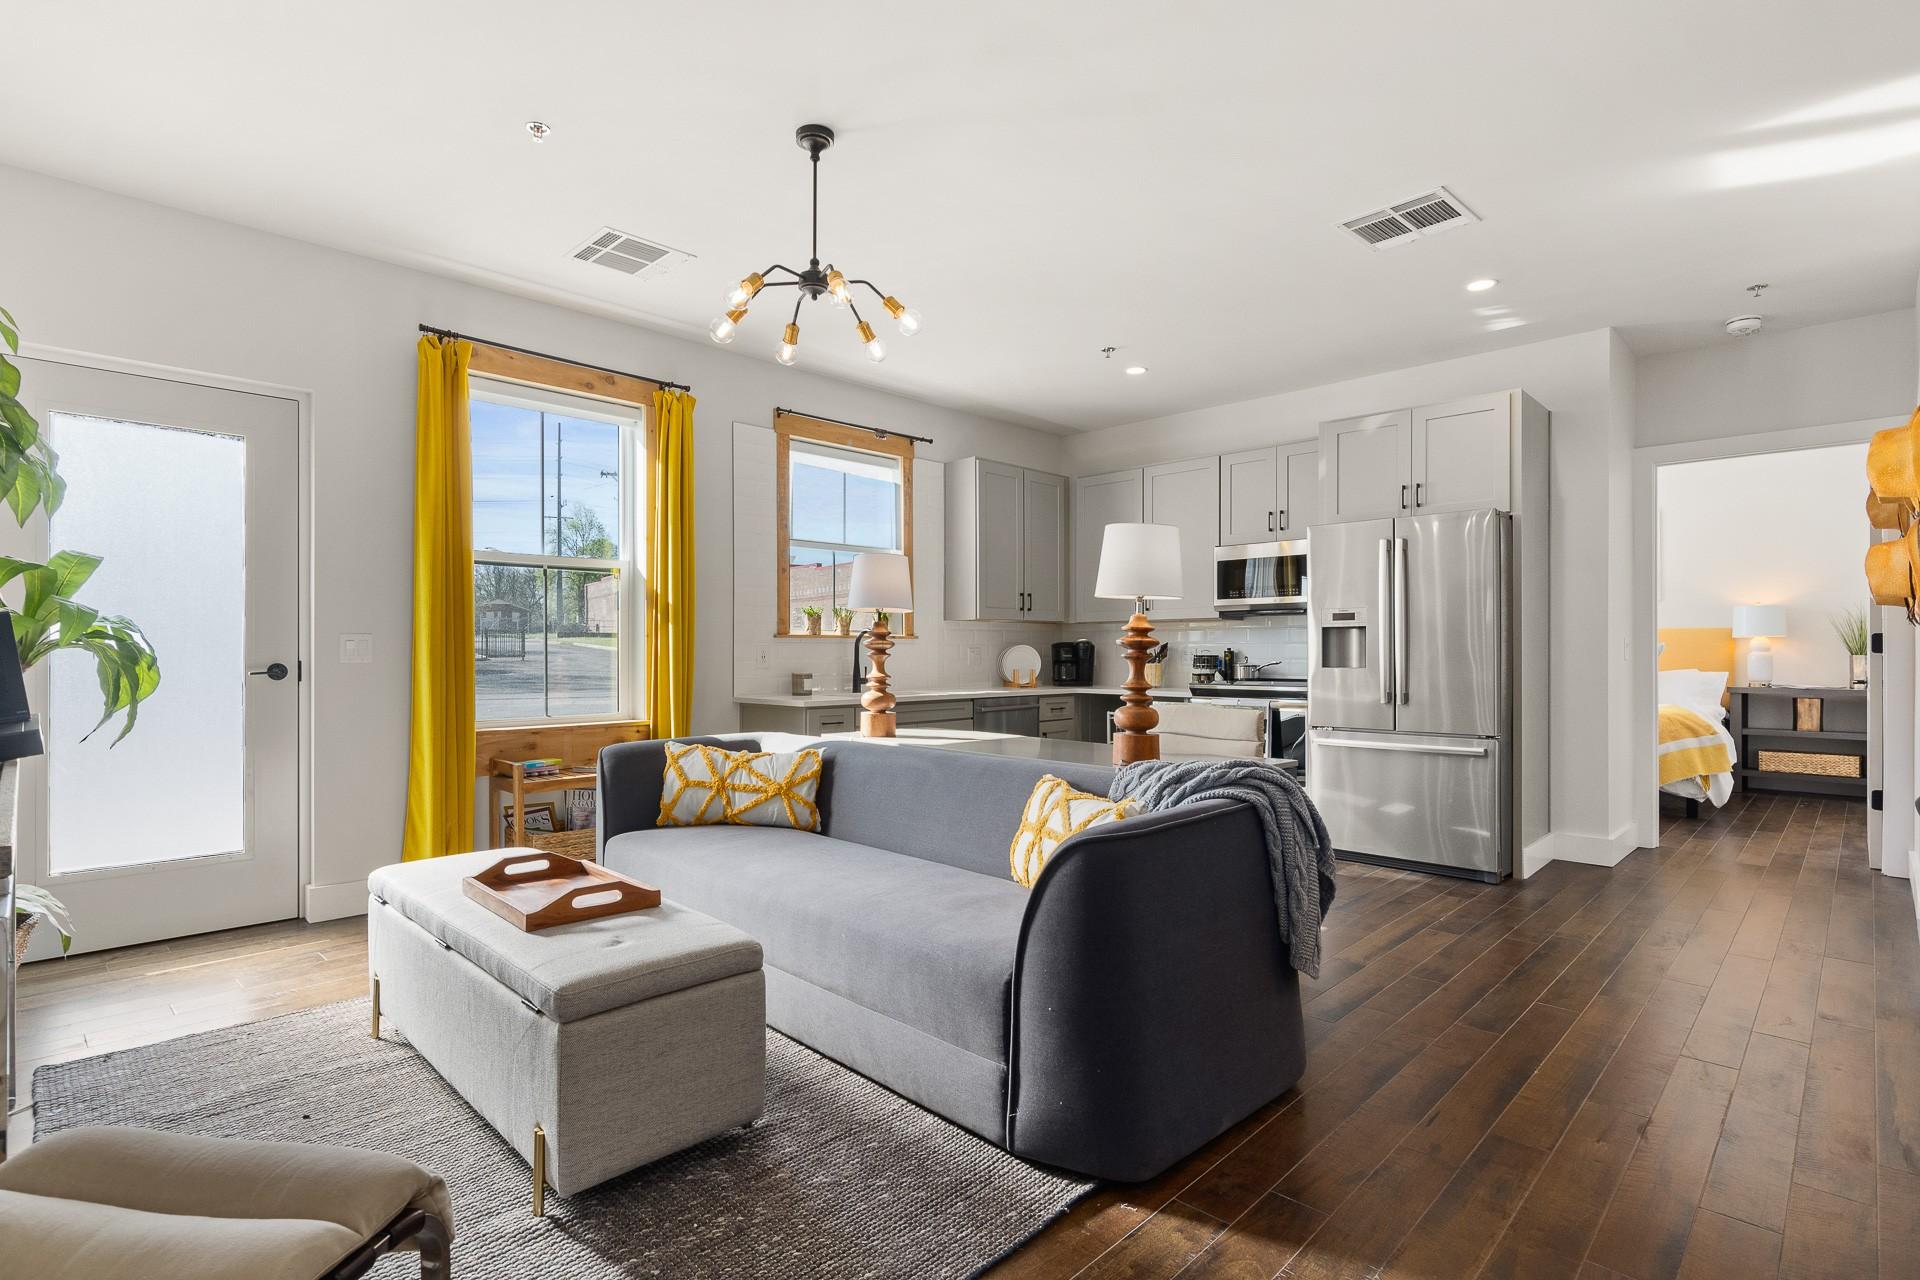 612 21st Ave N #113 Property Photo - Nashville, TN real estate listing